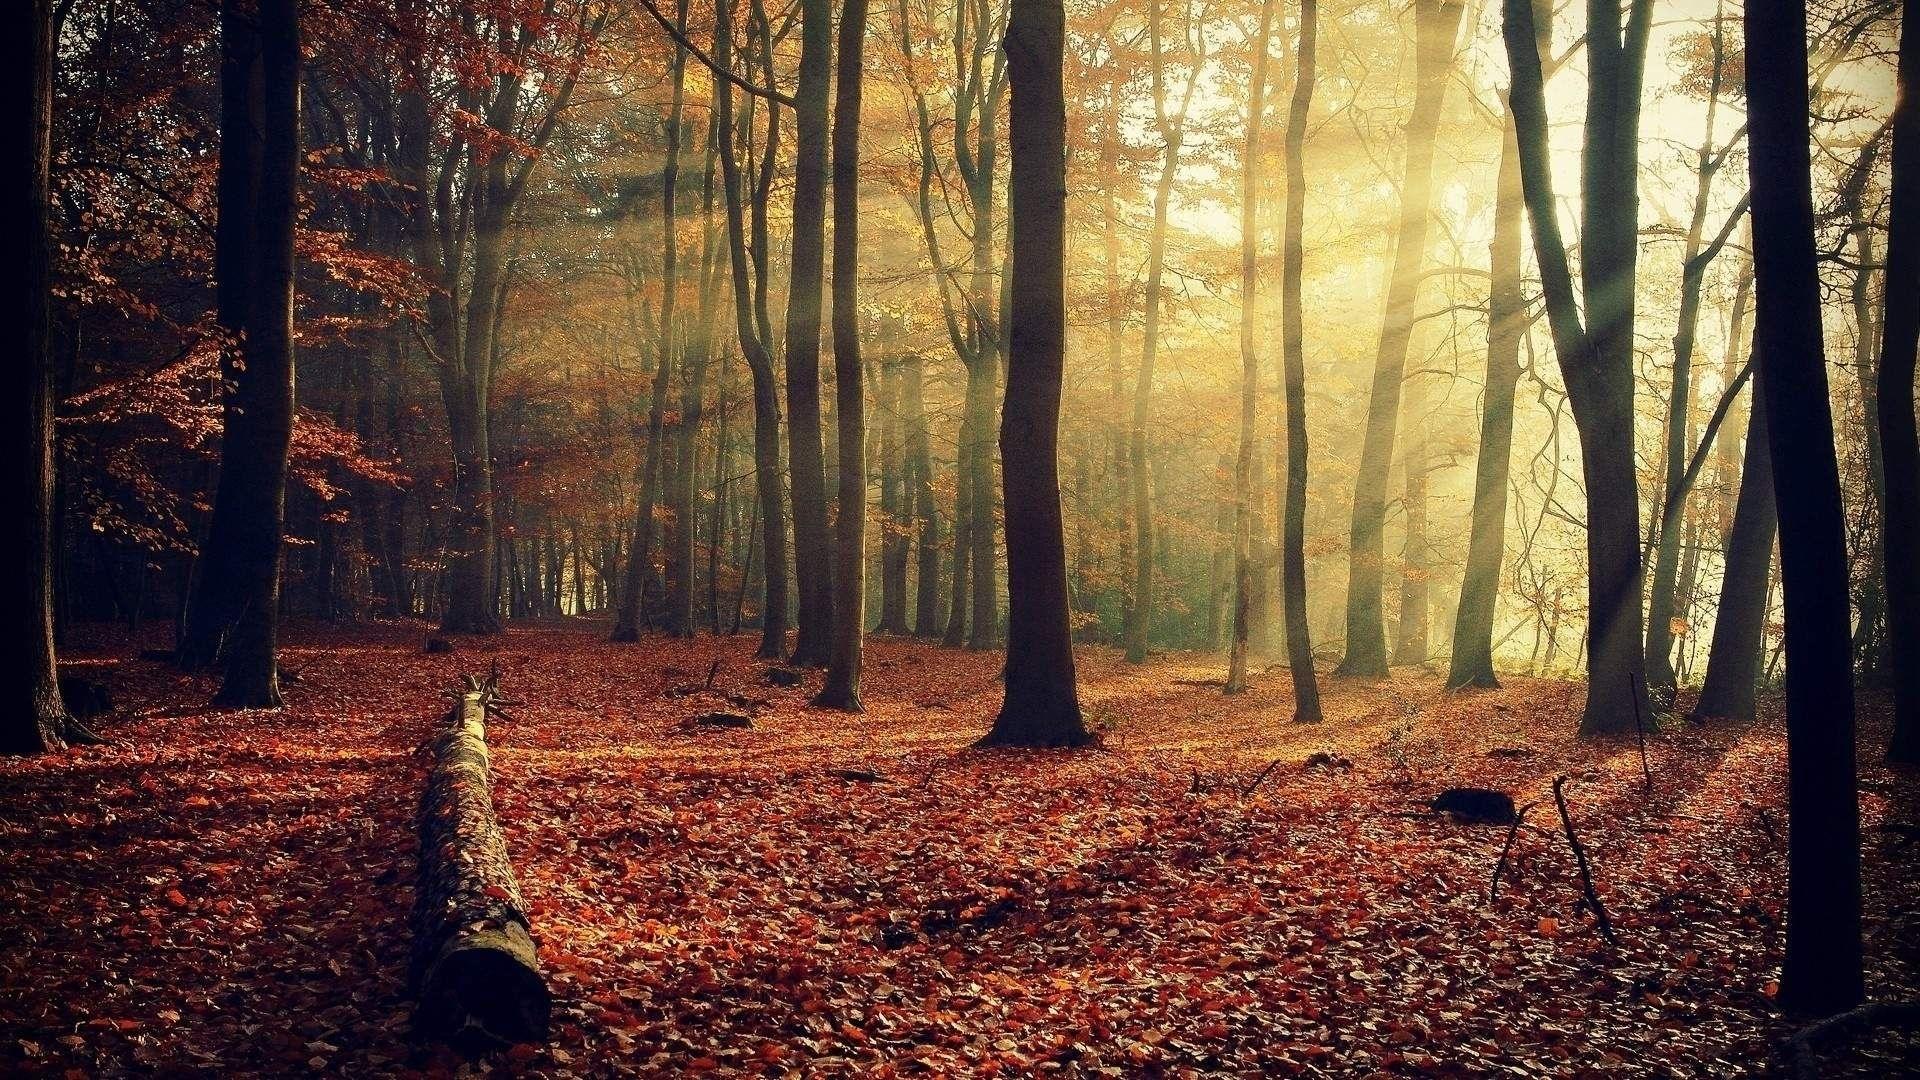 Похожее изображение   autumn   pinterest   forest wallpaper and